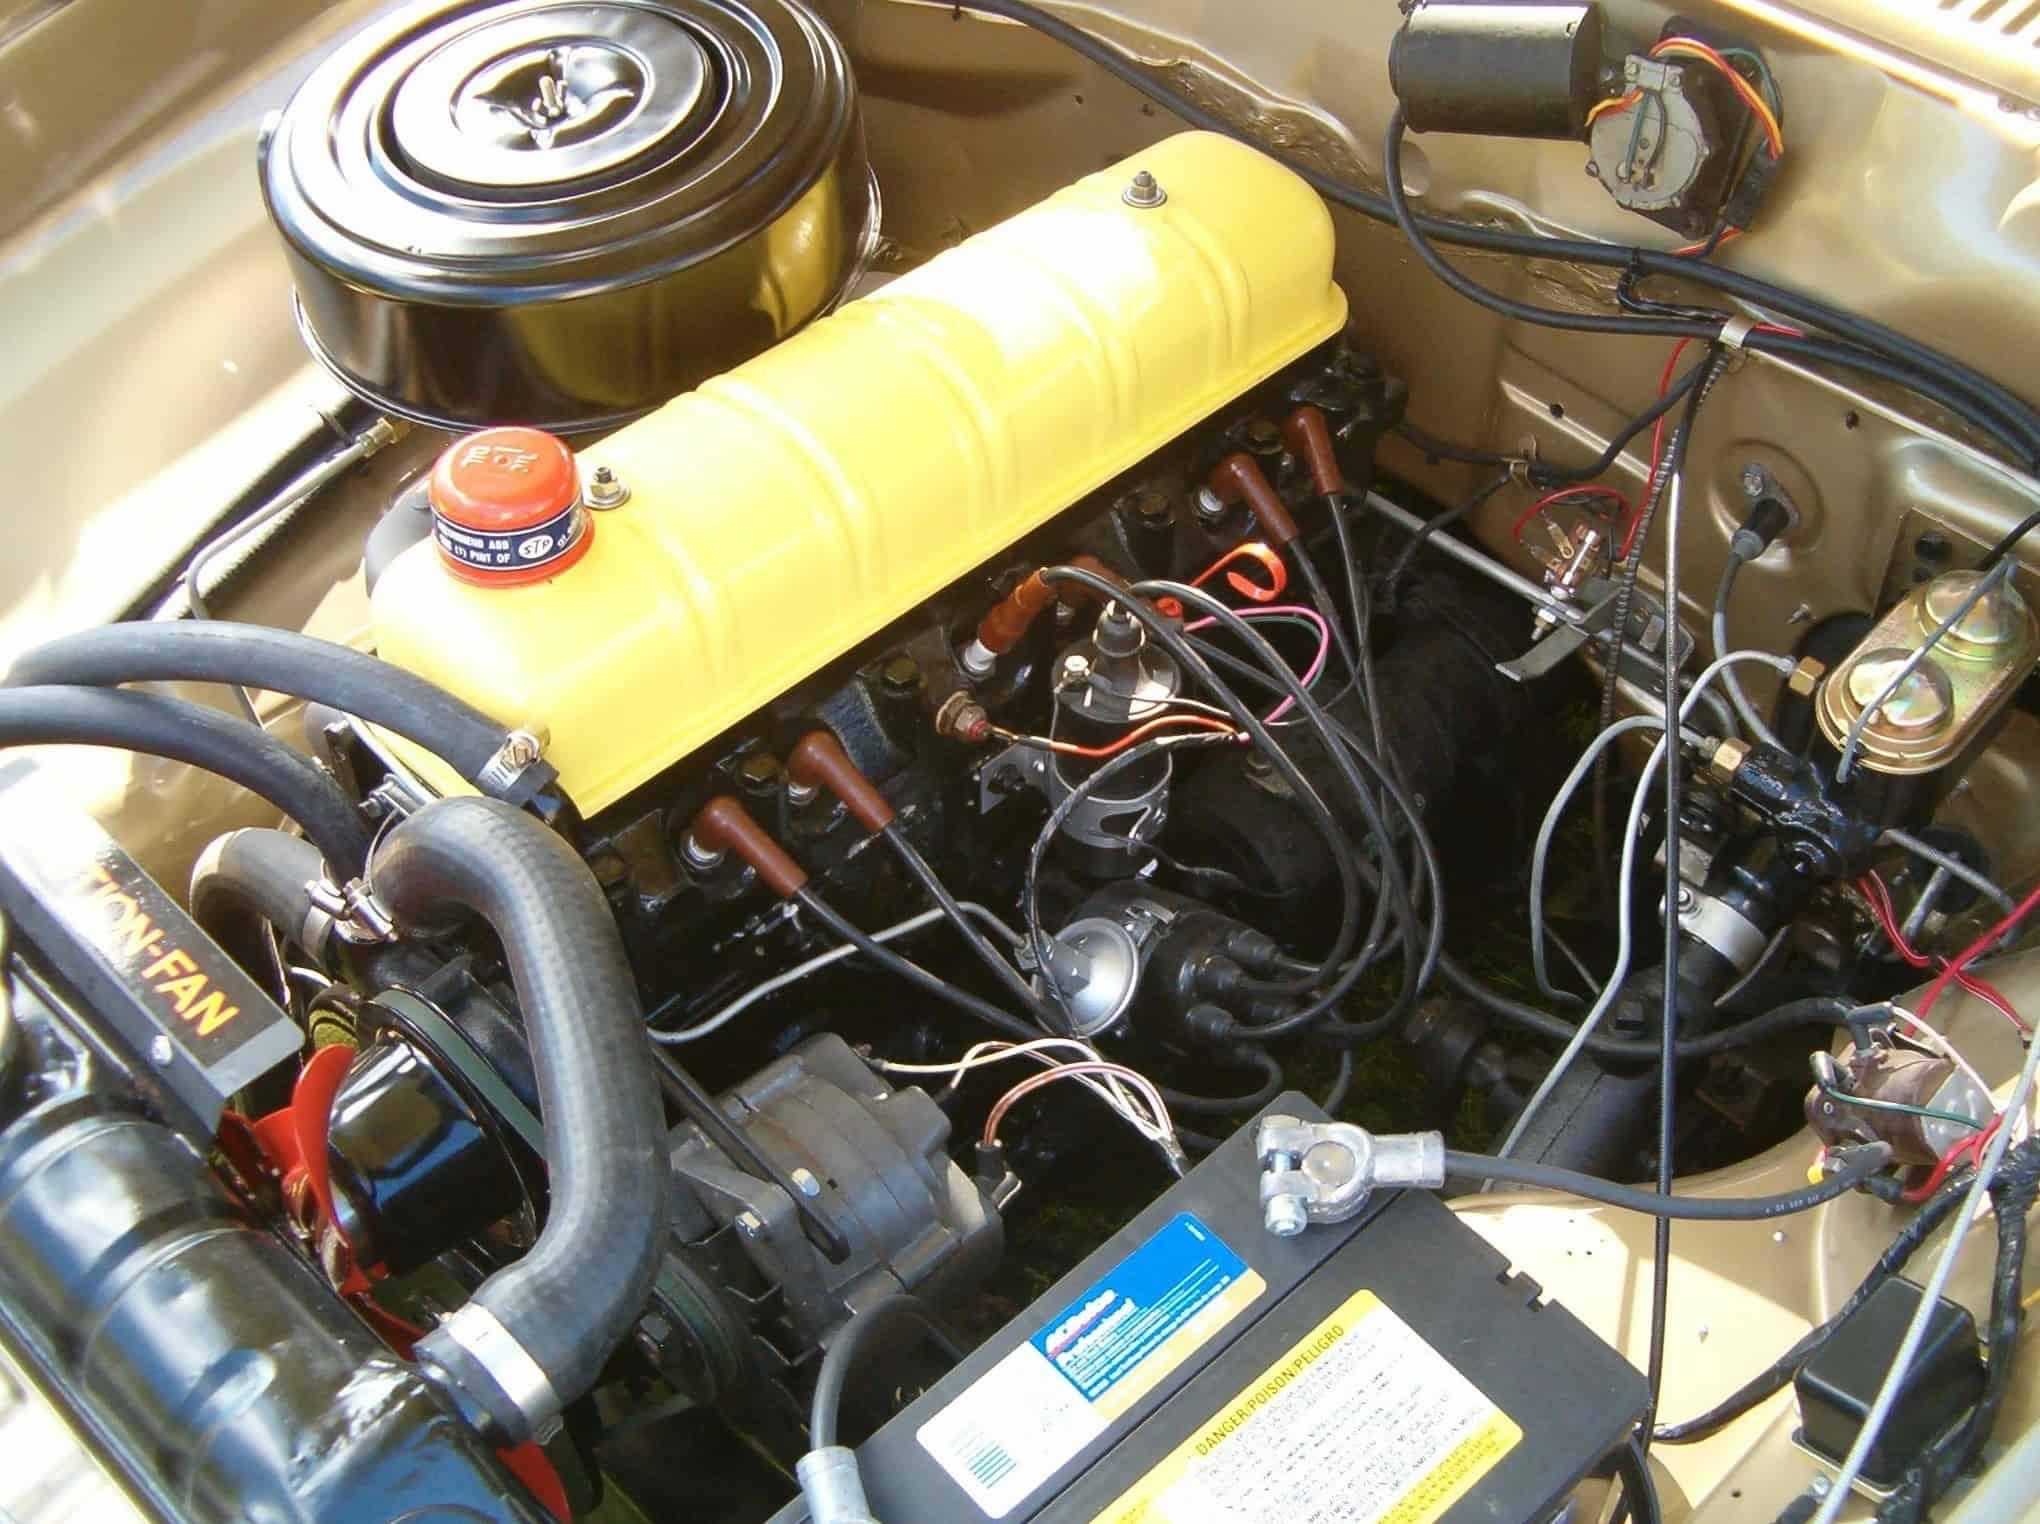 1963 Studebaker Lark Daytona, Studebaker convertible returned to the U.S. from Europe, ClassicCars.com Journal